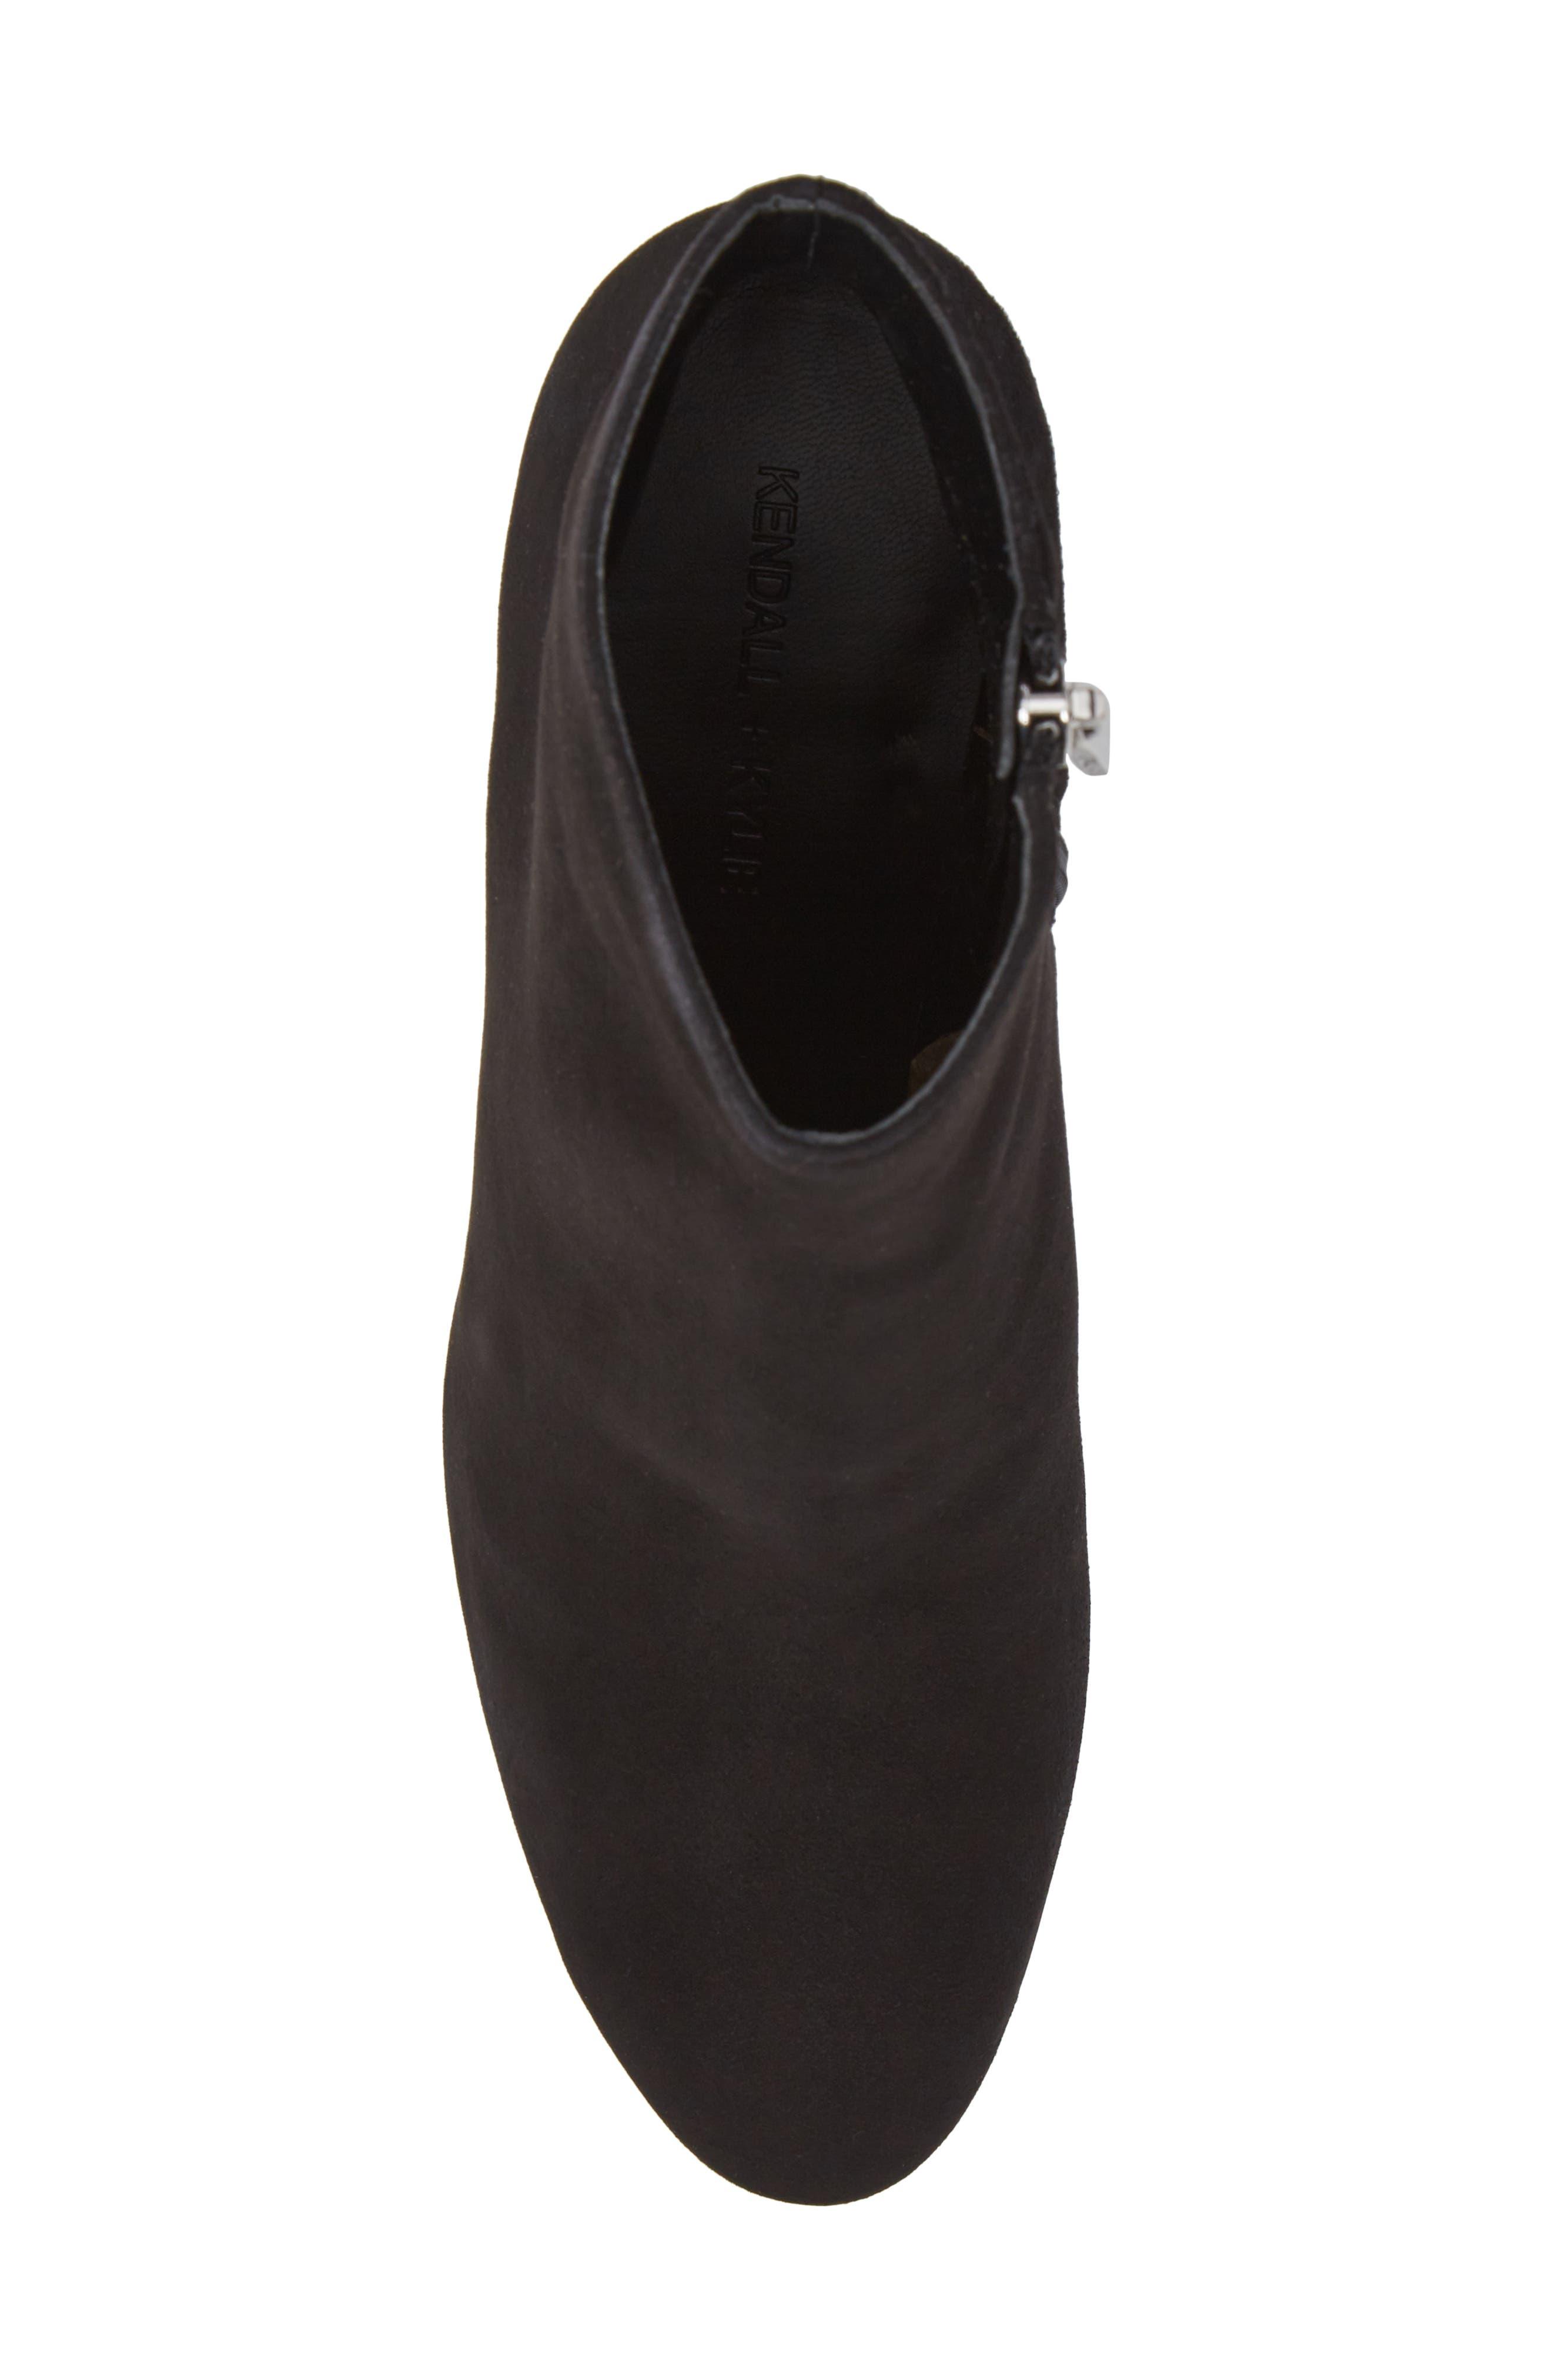 Blythe Studded Heel Bootie,                             Alternate thumbnail 5, color,                             001